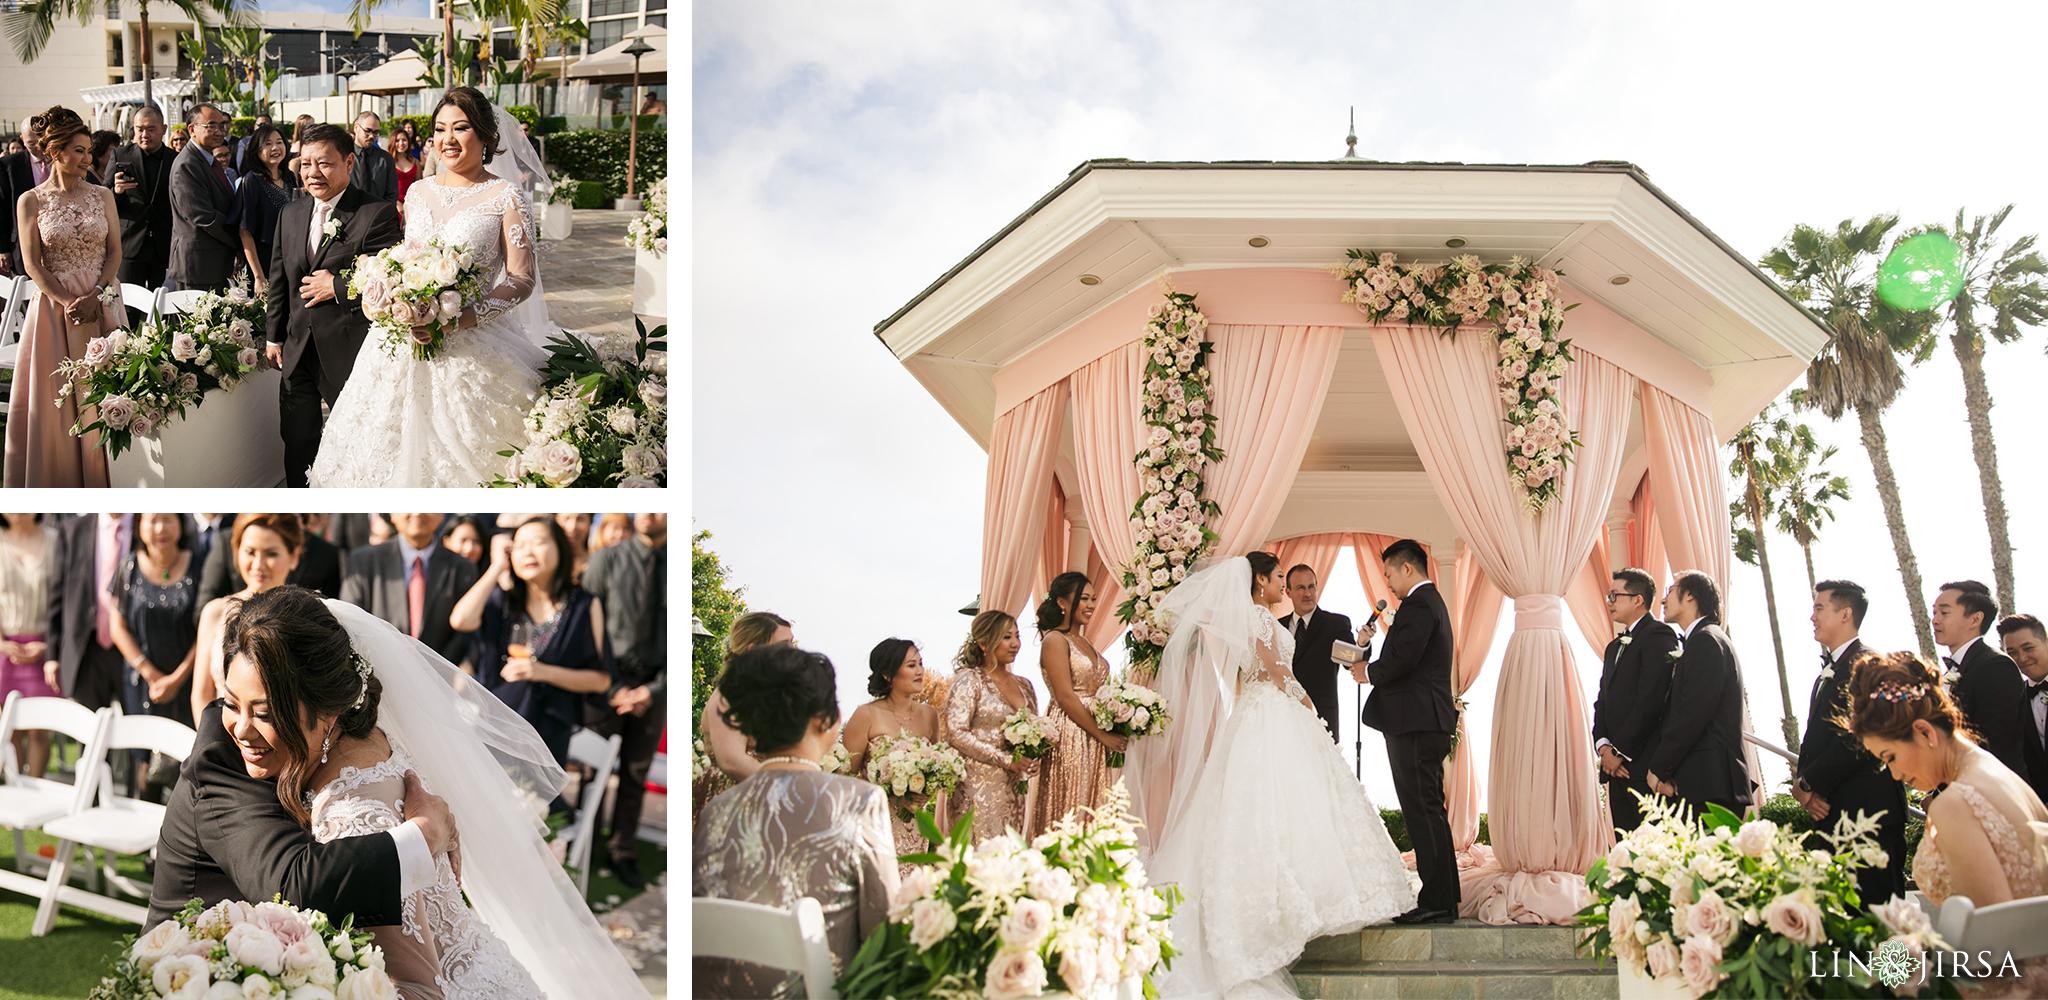 16 The Newport Beach Marriott Hotel Wedding Photography